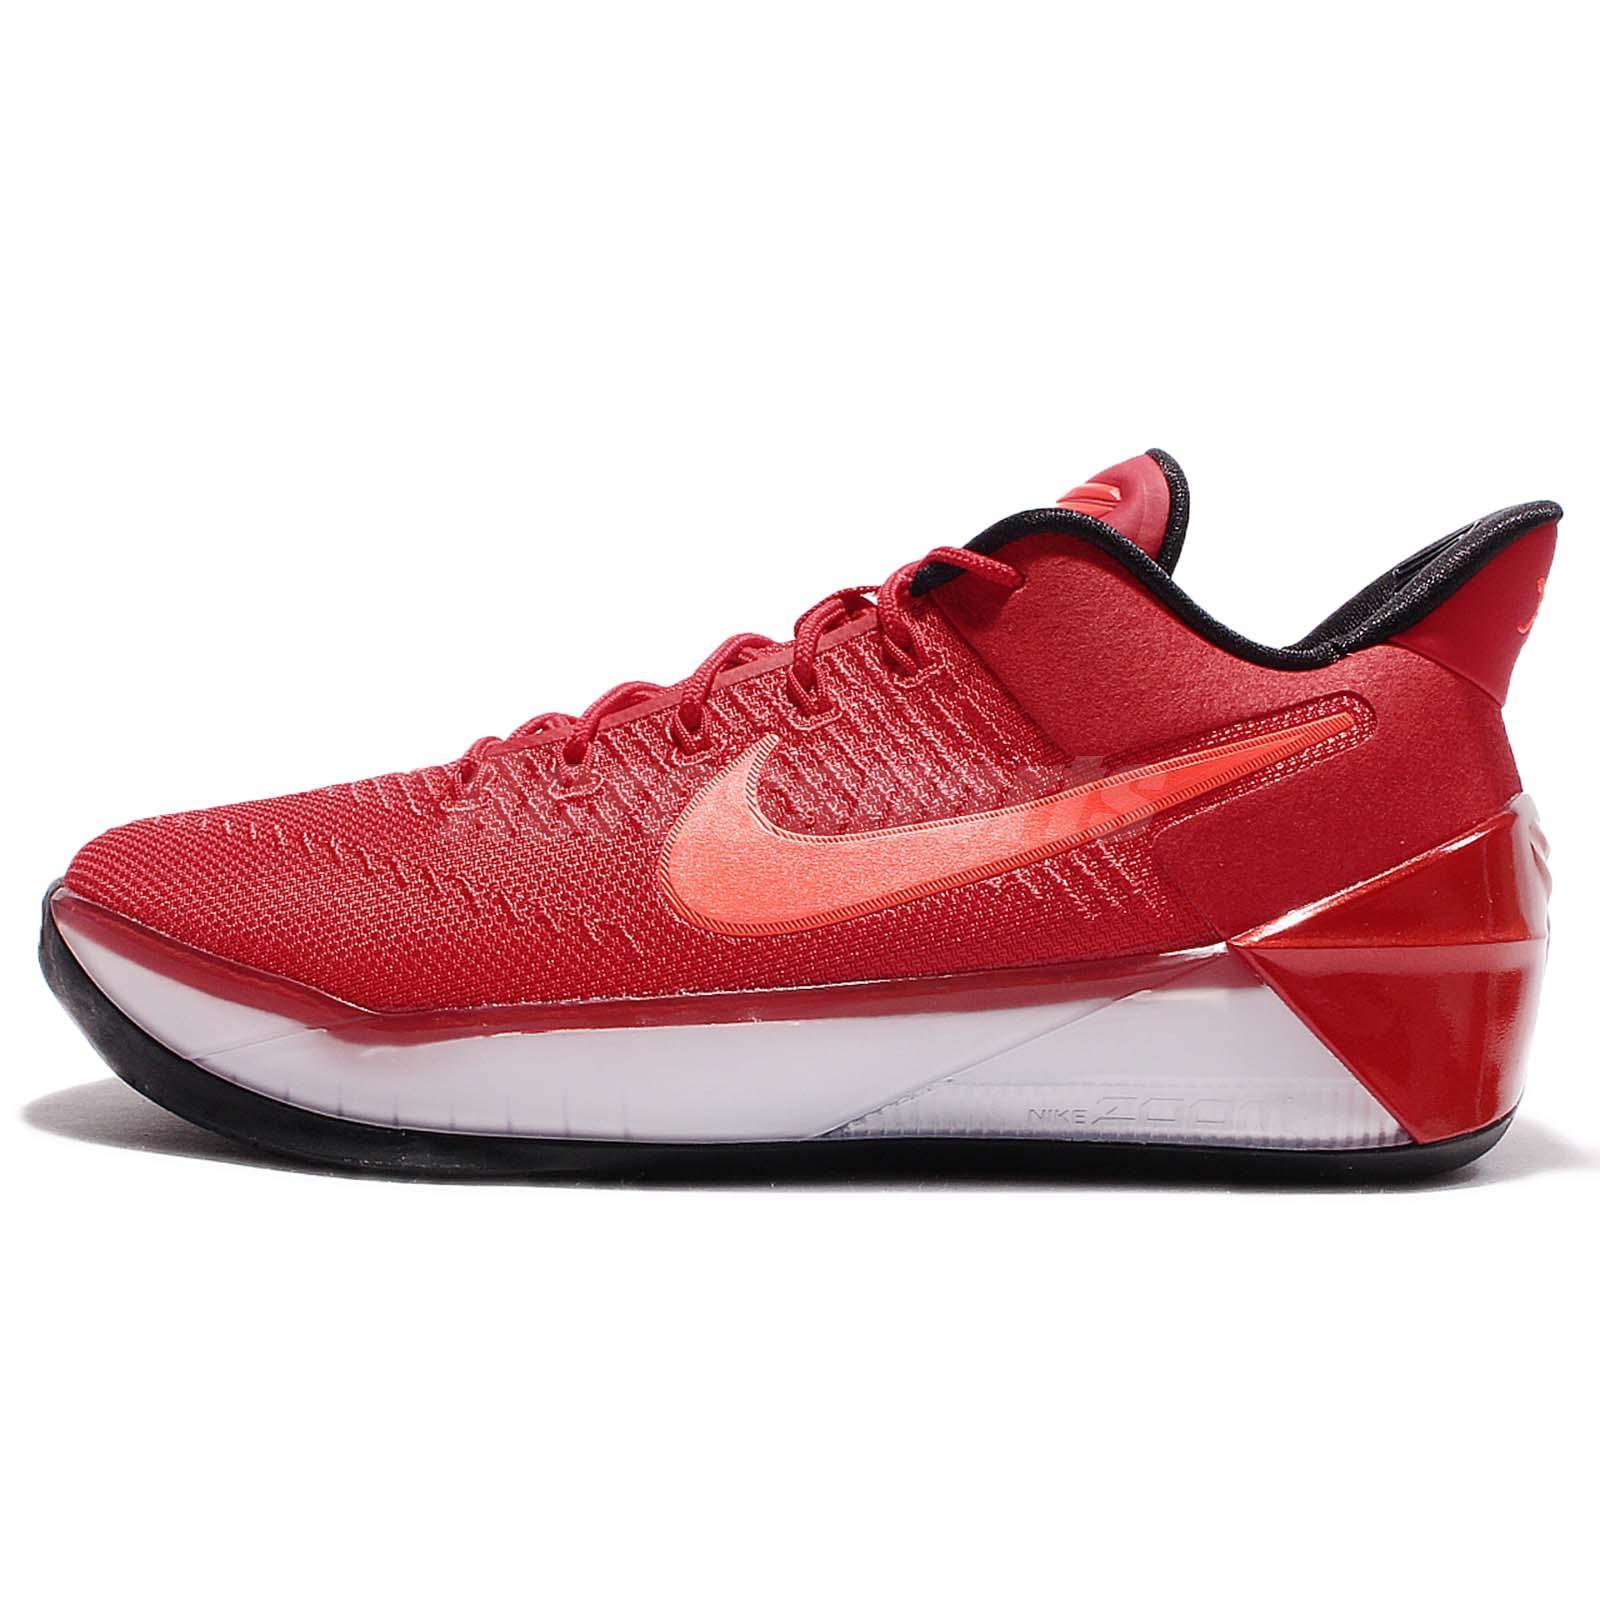 watch d8f94 a1280 Nike Kobe A.D. GS Bryant AD XII 12 University Red Men Basketball Shoe 869987 -608